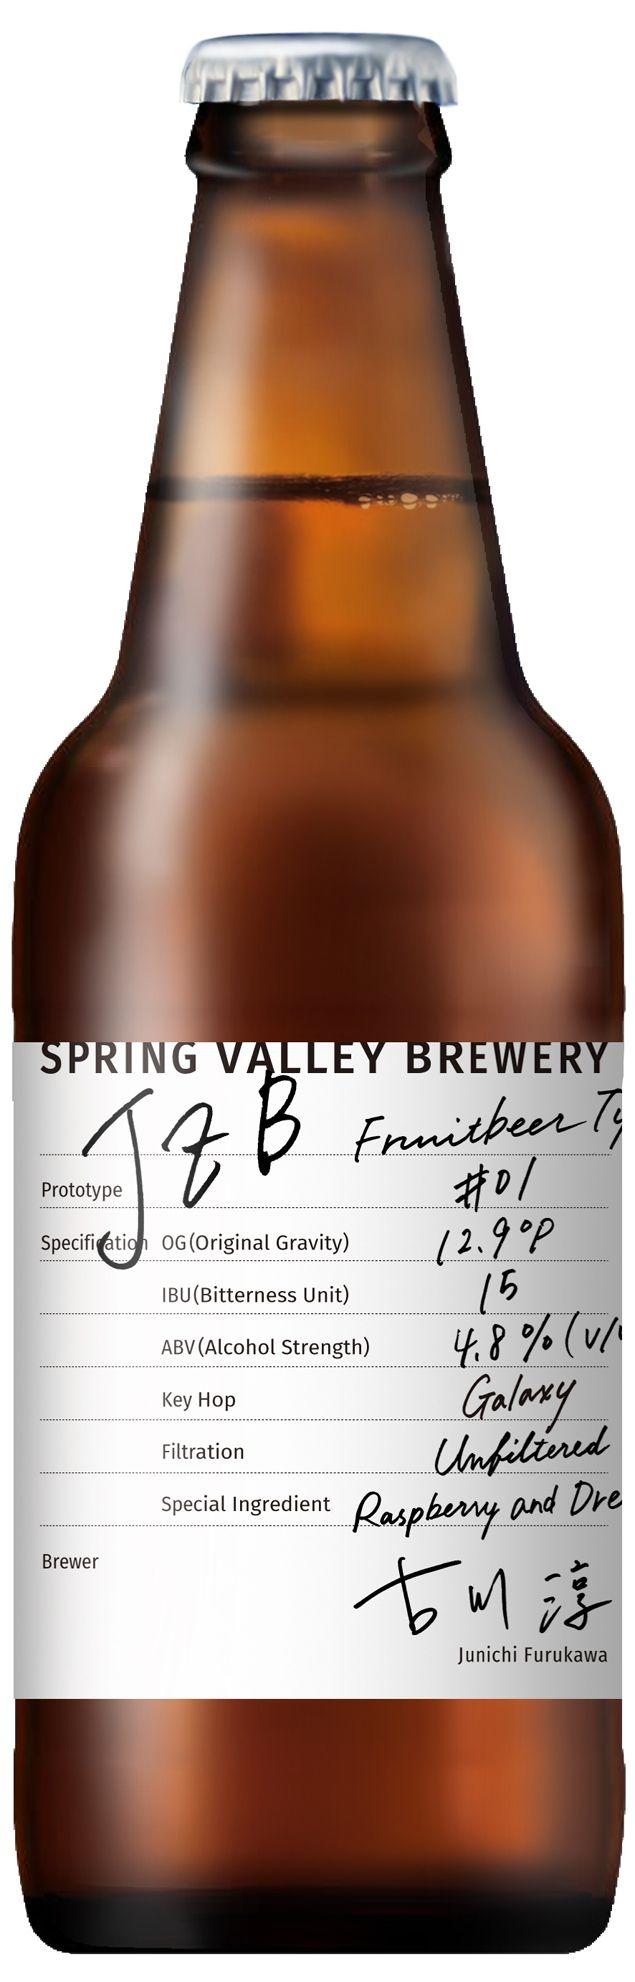 Spring Valley Brewery